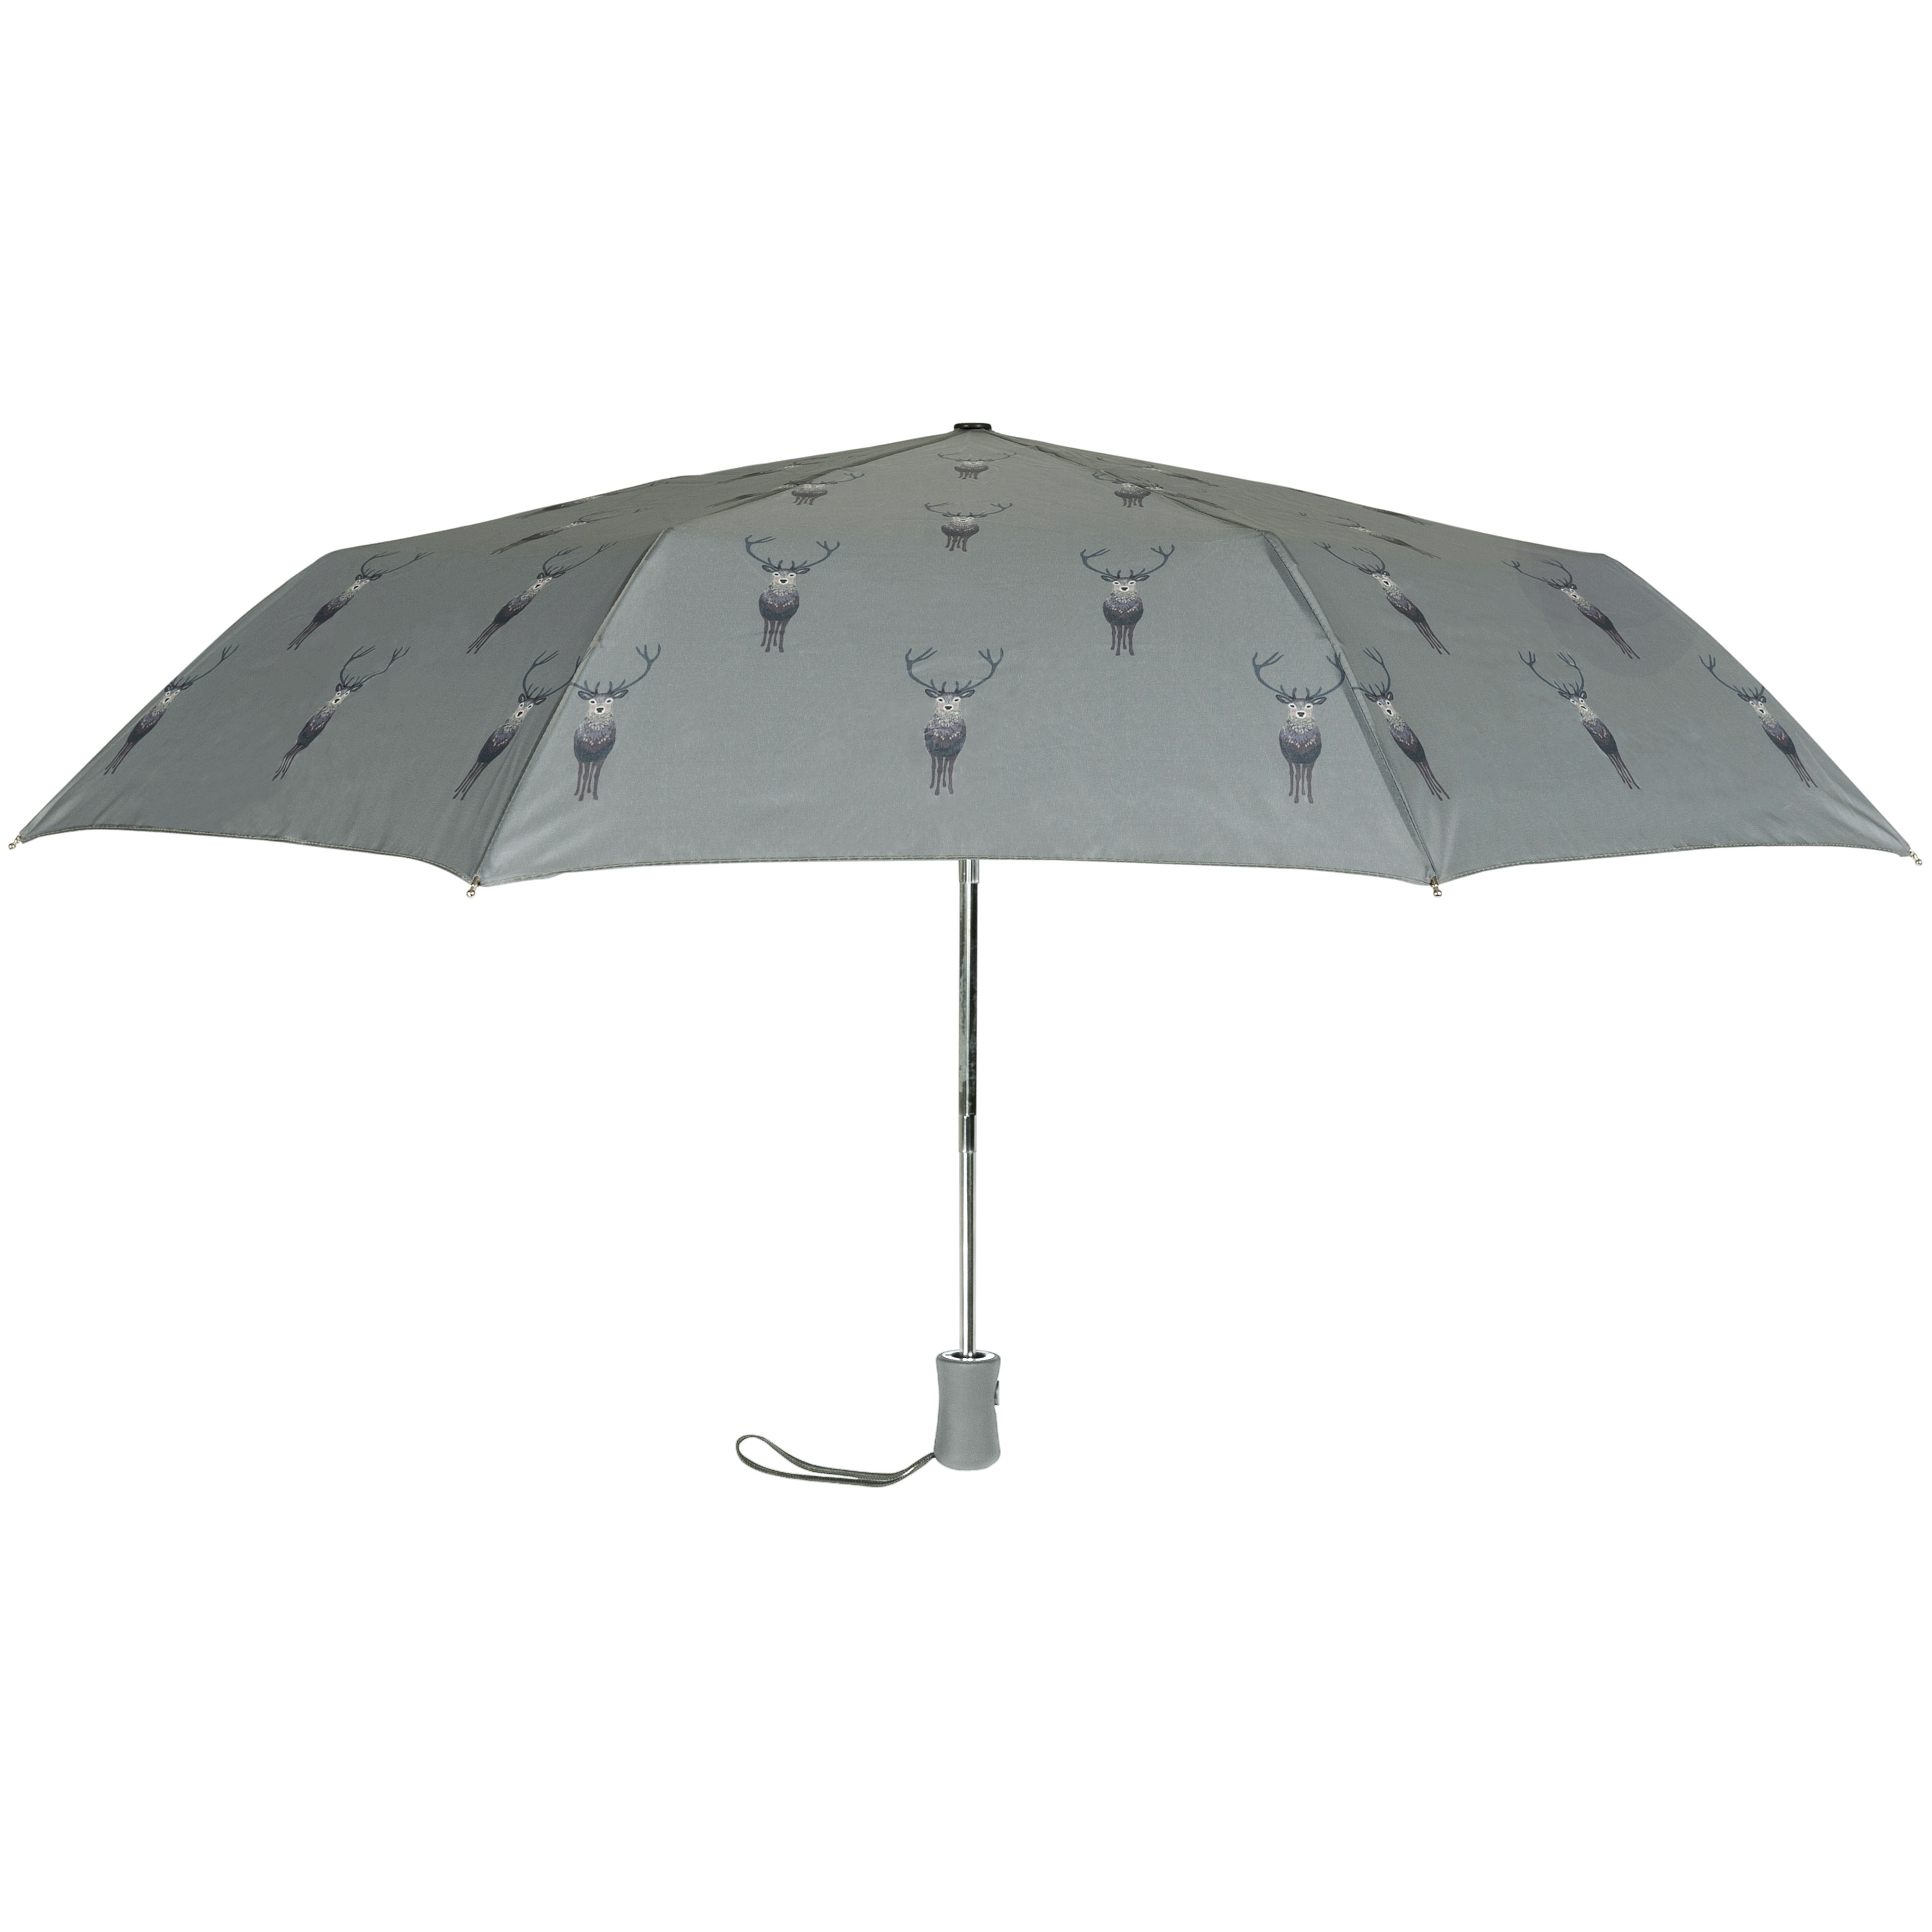 Stag Umbrella Apli Construction